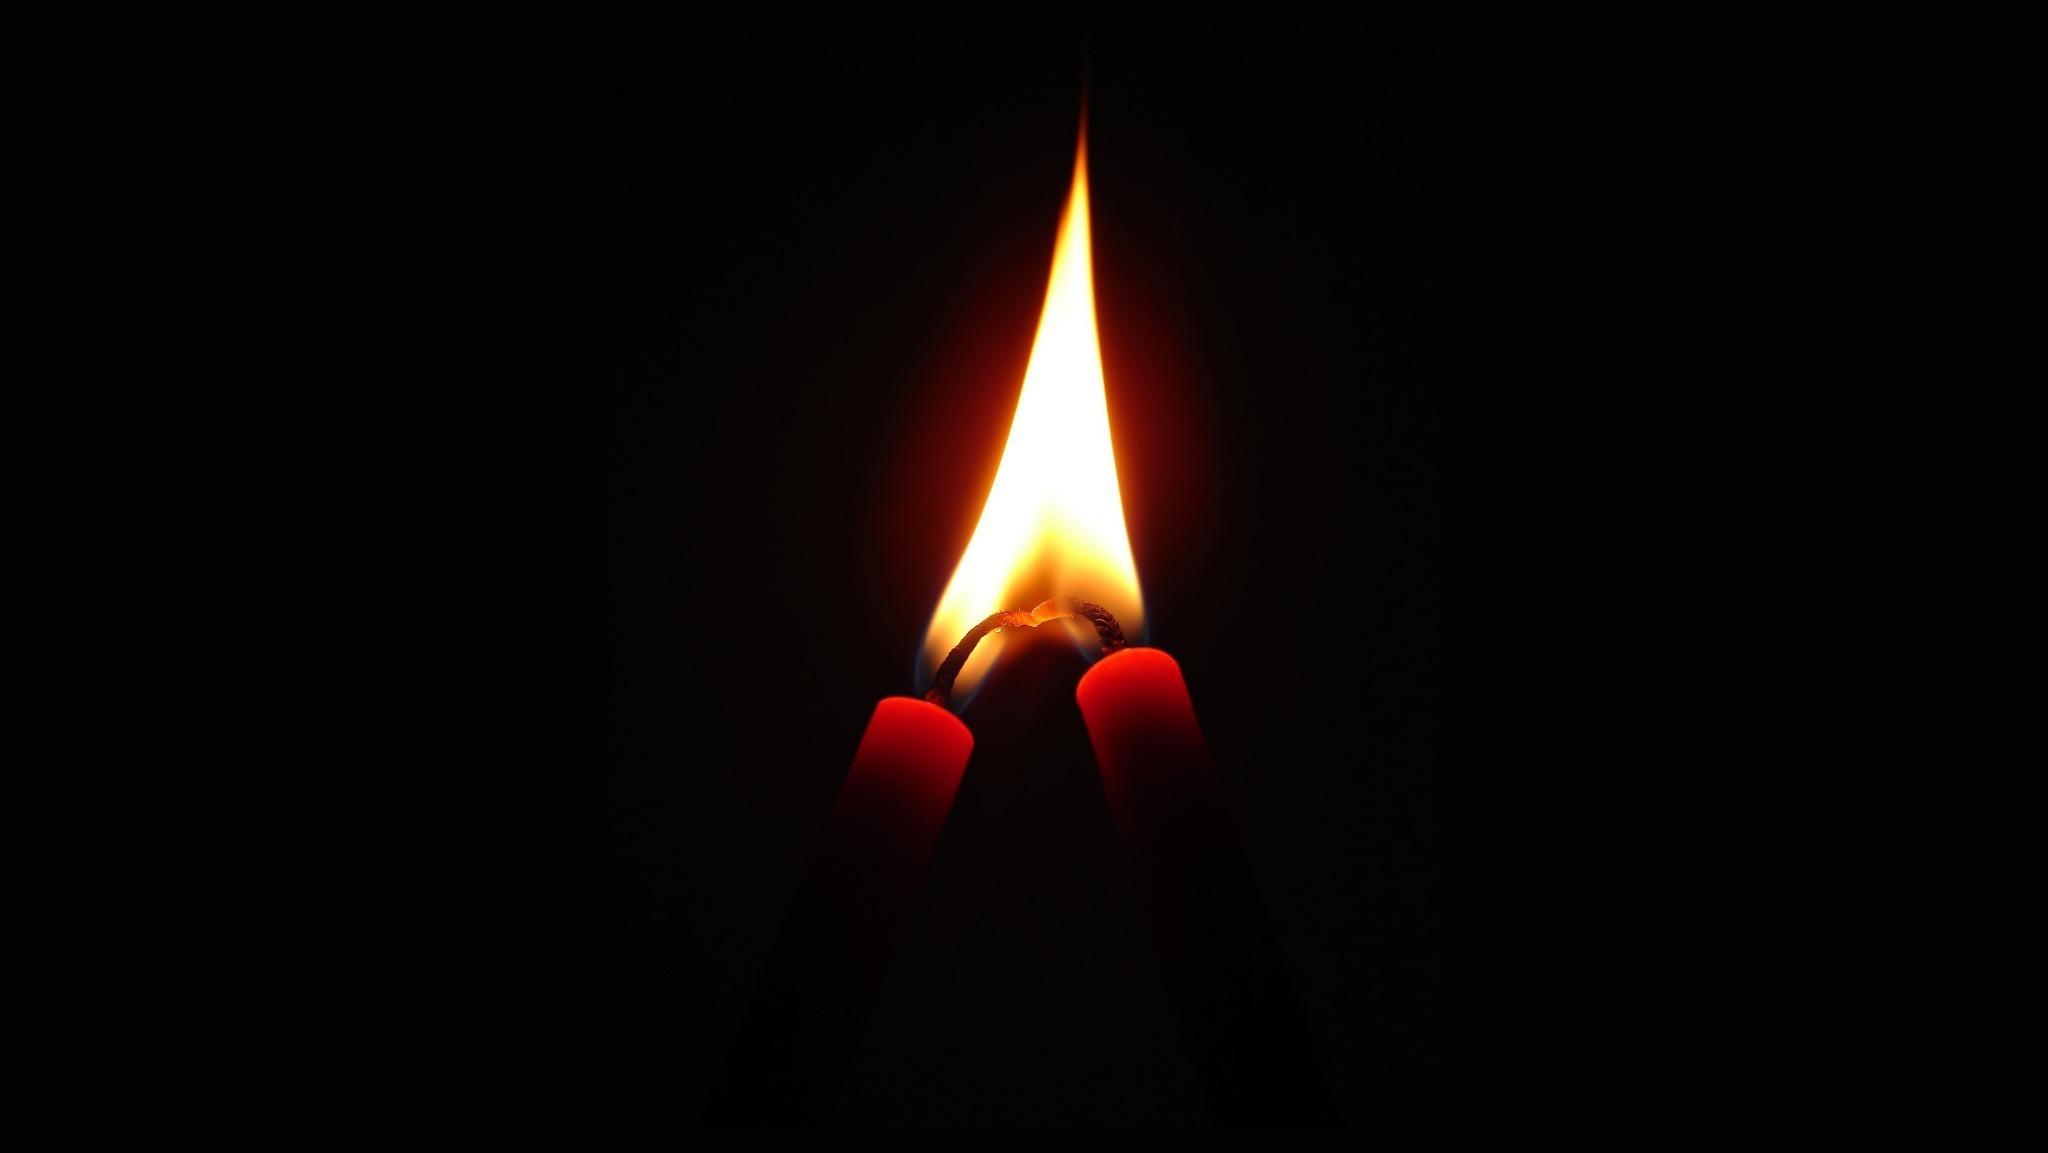 Fredsljuset kommer till Boden 15 december